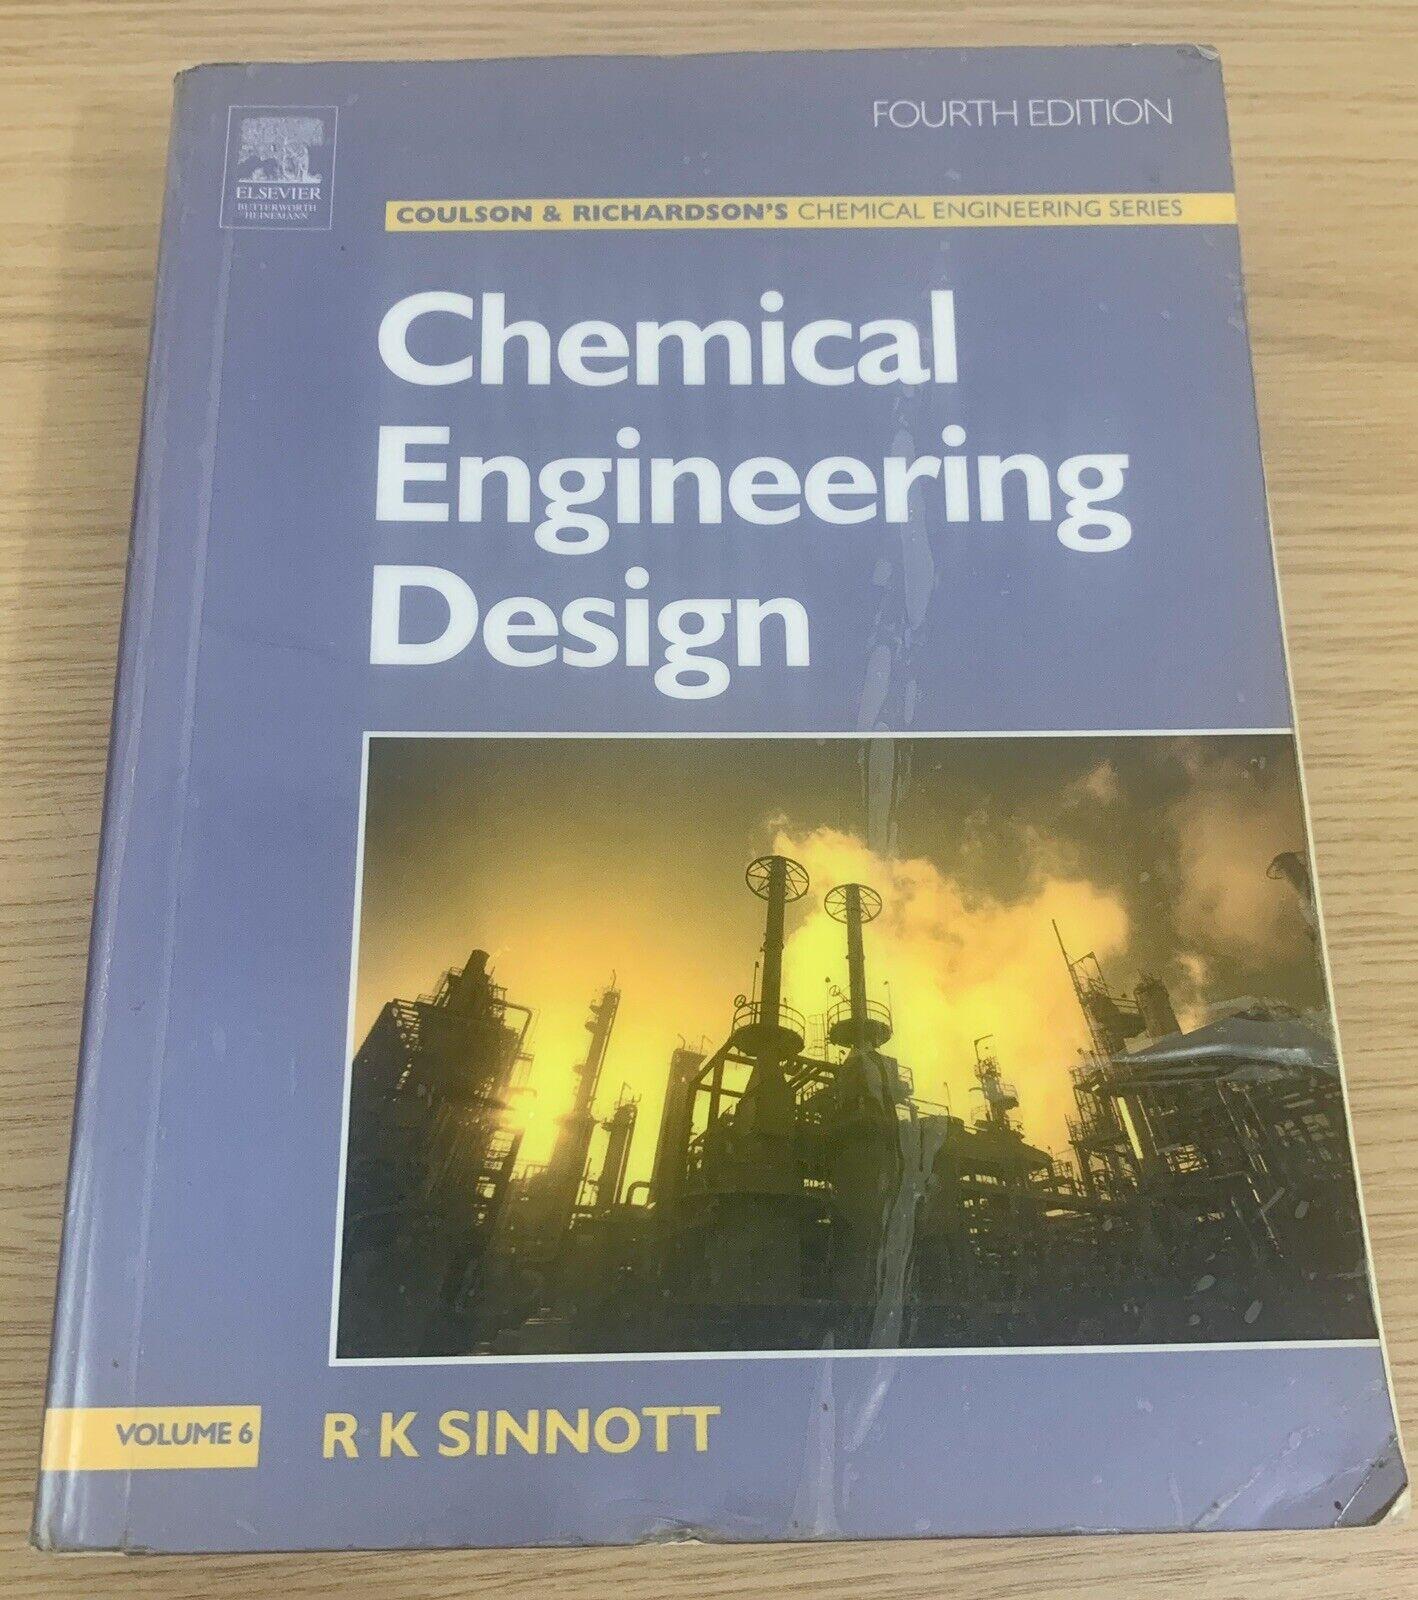 Chemical Engineering Design Chemical Engineering Volume 6 By R K Sinnott Paperback 2005 For Sale Online Ebay